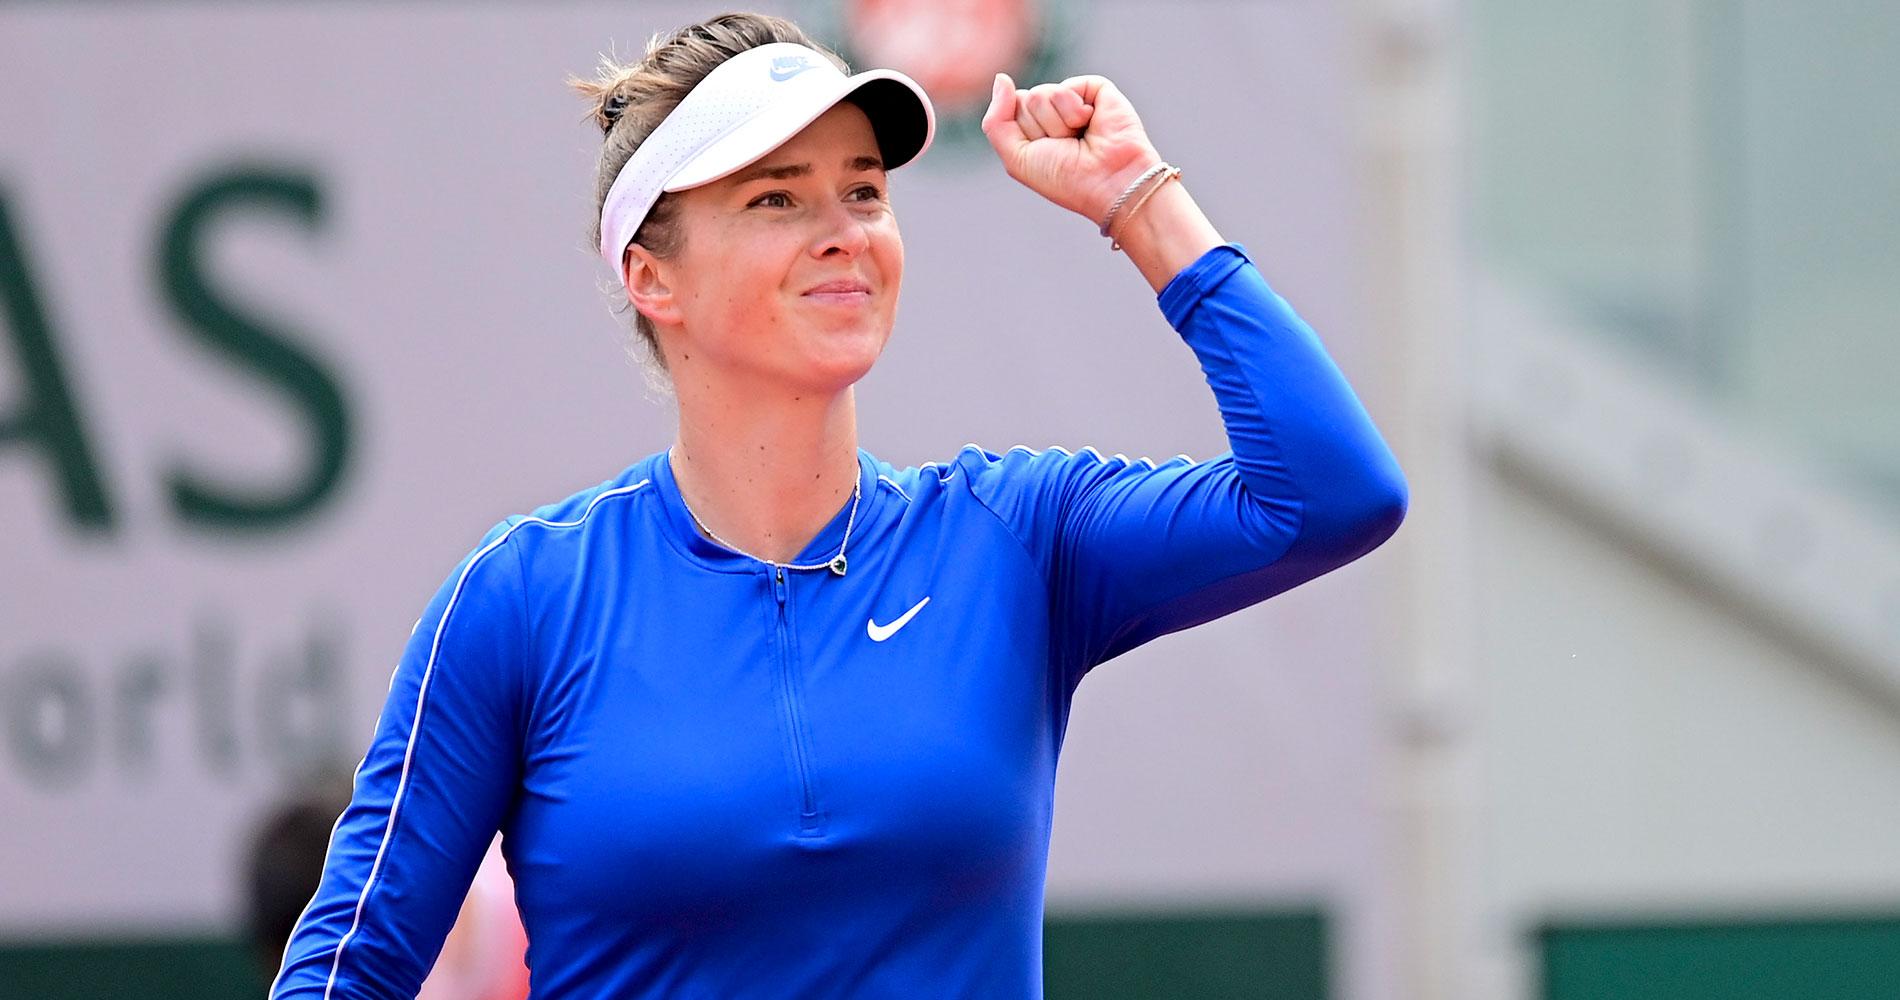 Elina Svitolina at Roland-Garros 2020 fourth round